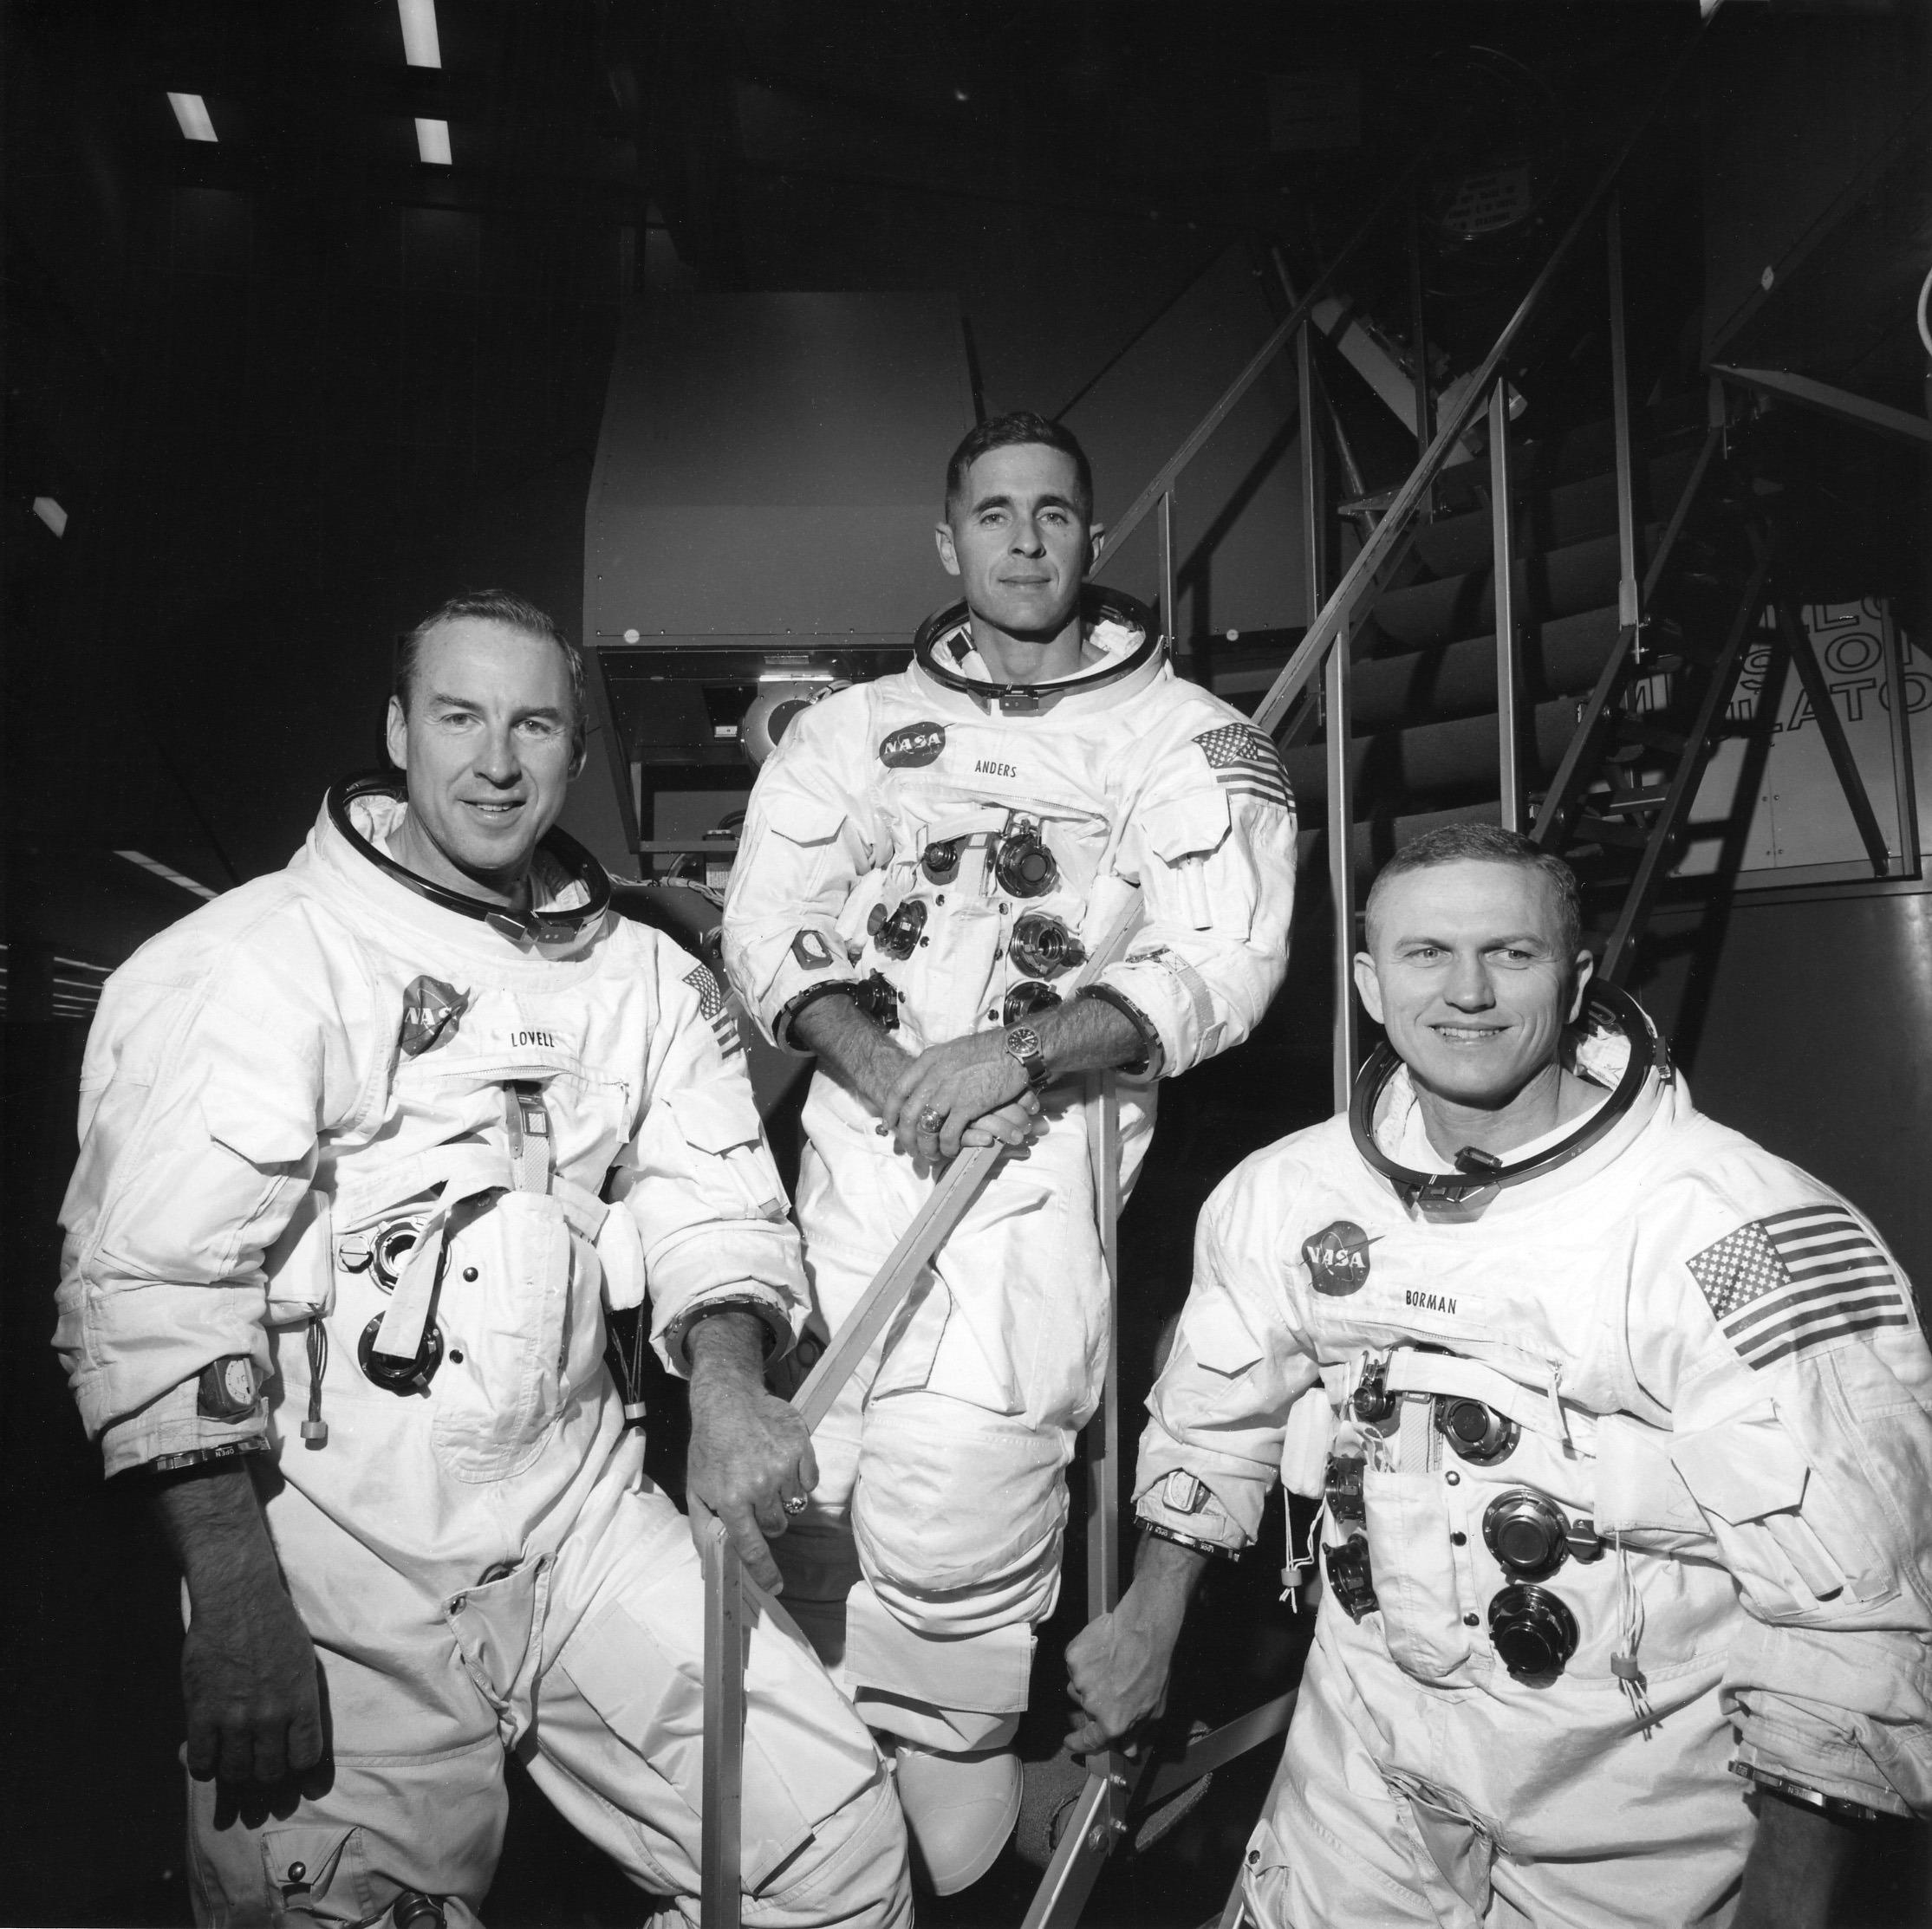 apollo space flight crews - photo #35